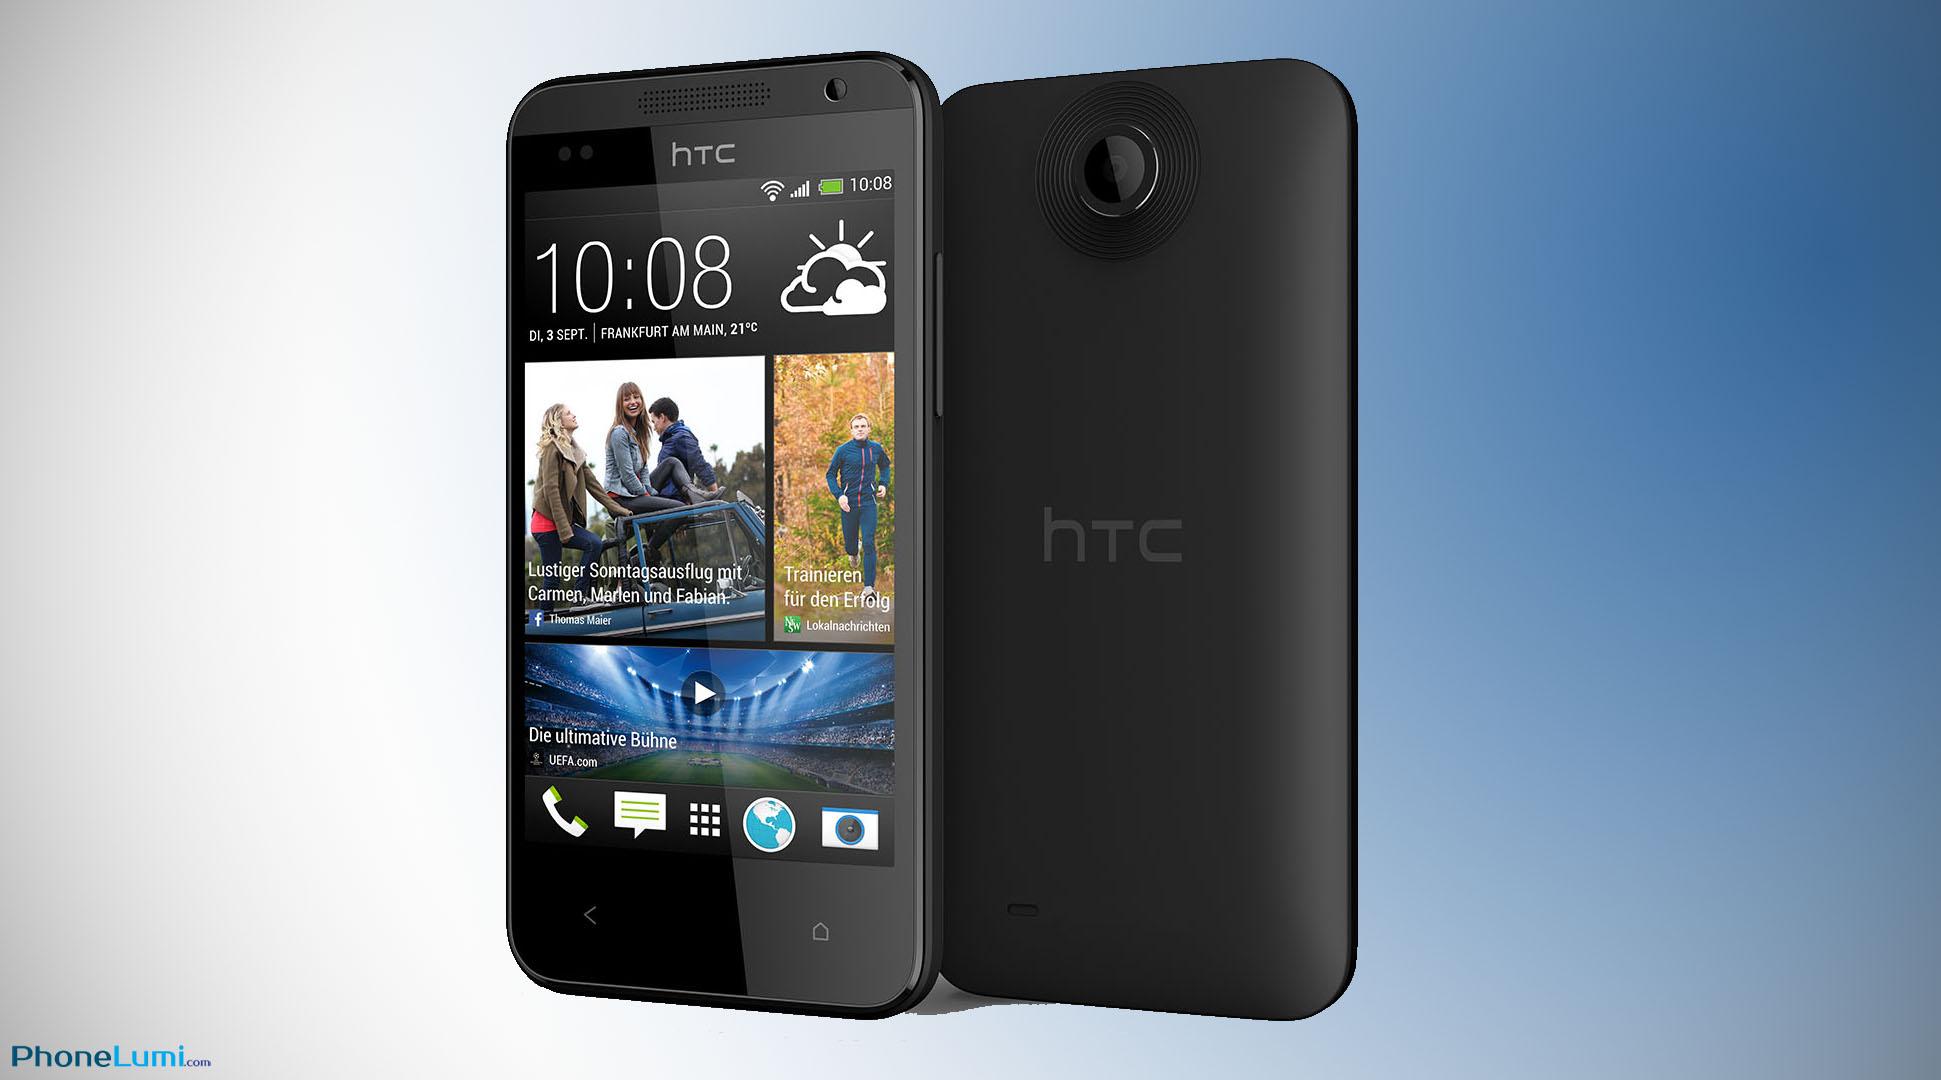 Rom gốc HTC Desire 300 sửa lỗi treo logo